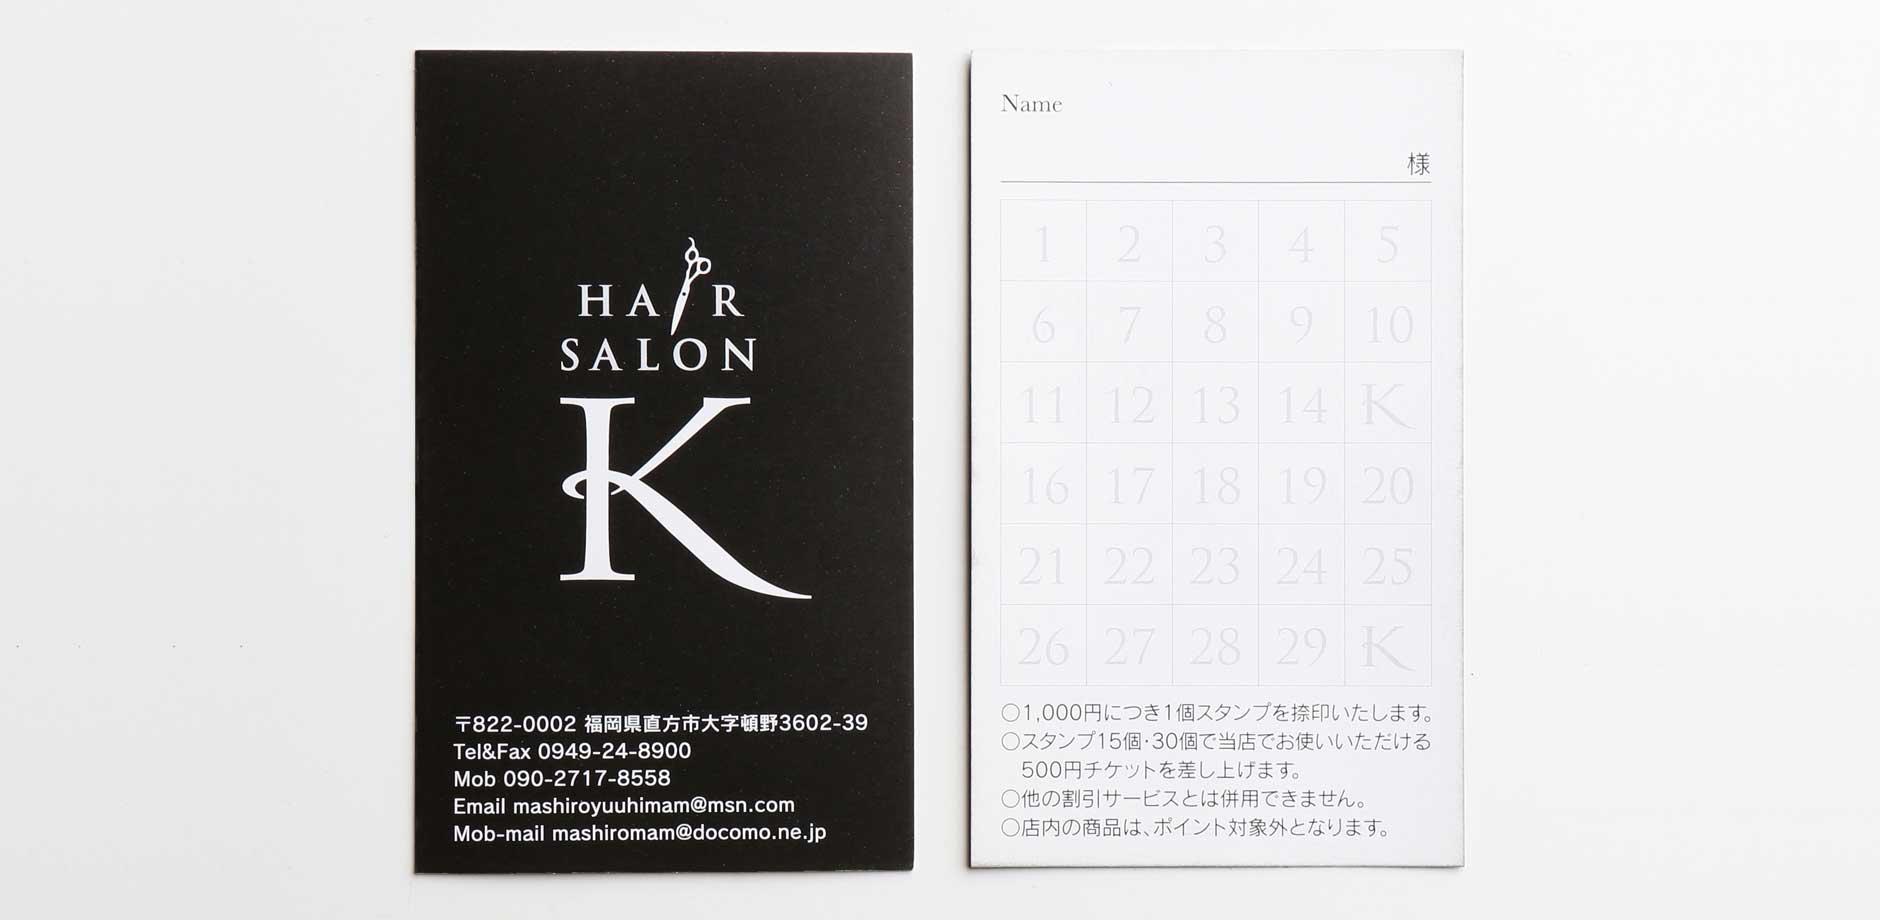 HAIR SARON K画像